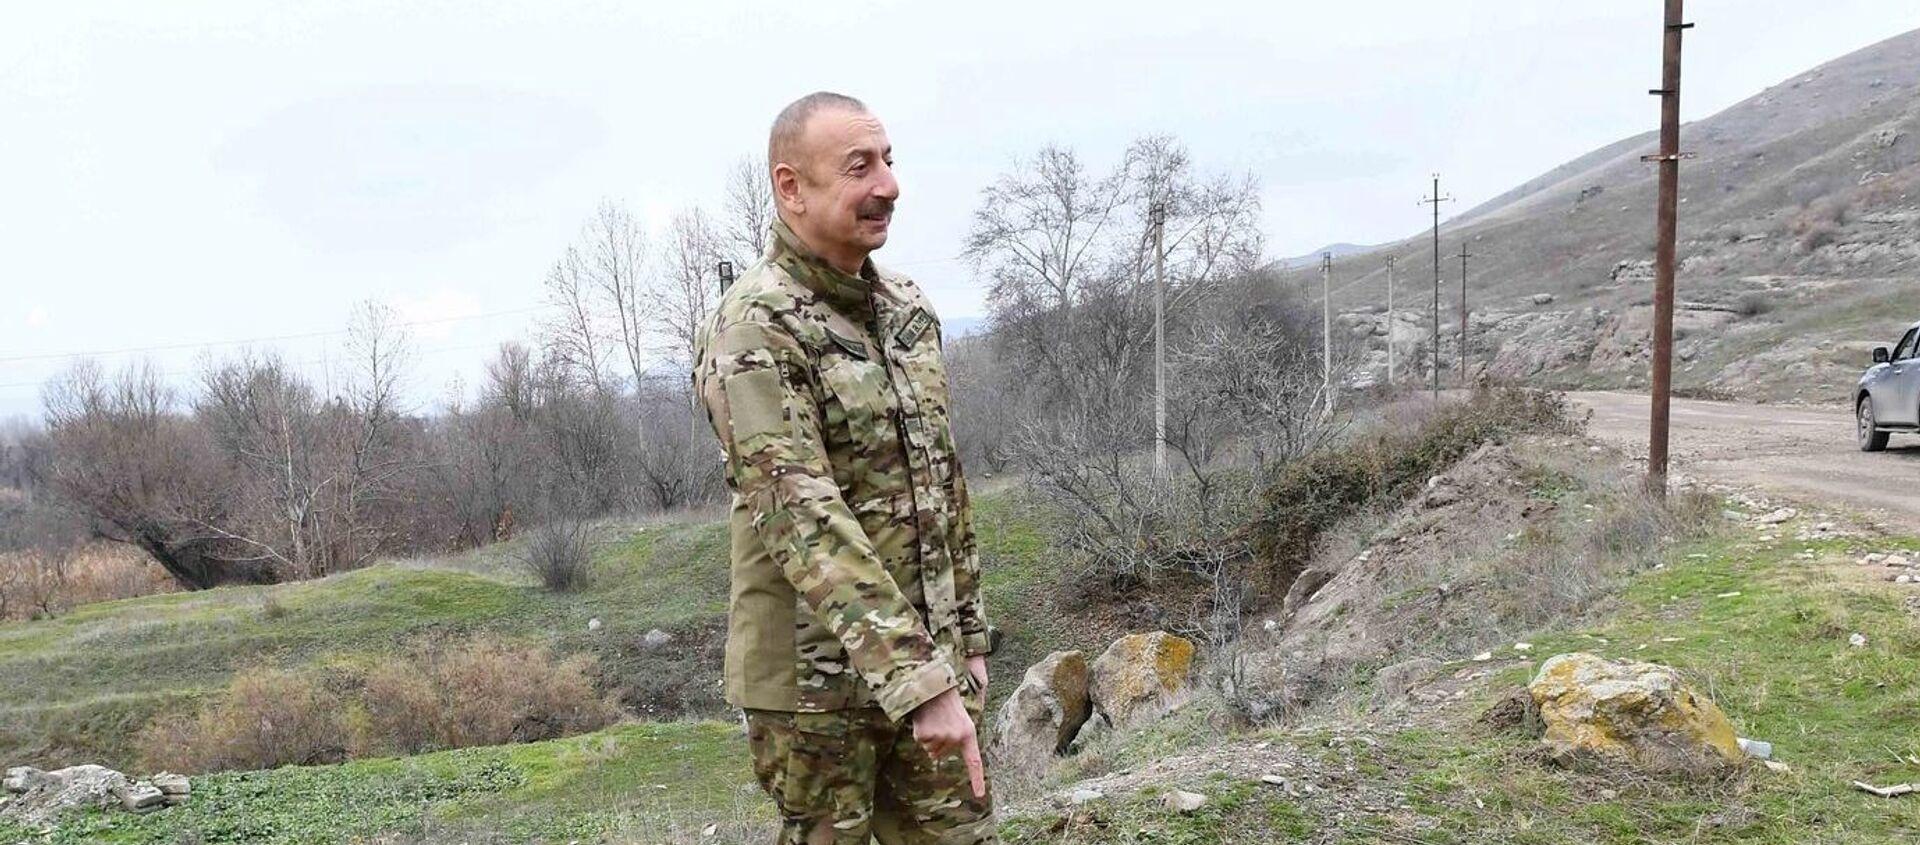 Президент Азербайджана И. Алиев посетил районы, перешедшие под влияние Азербайджана - Sputnik Армения, 1920, 18.04.2021